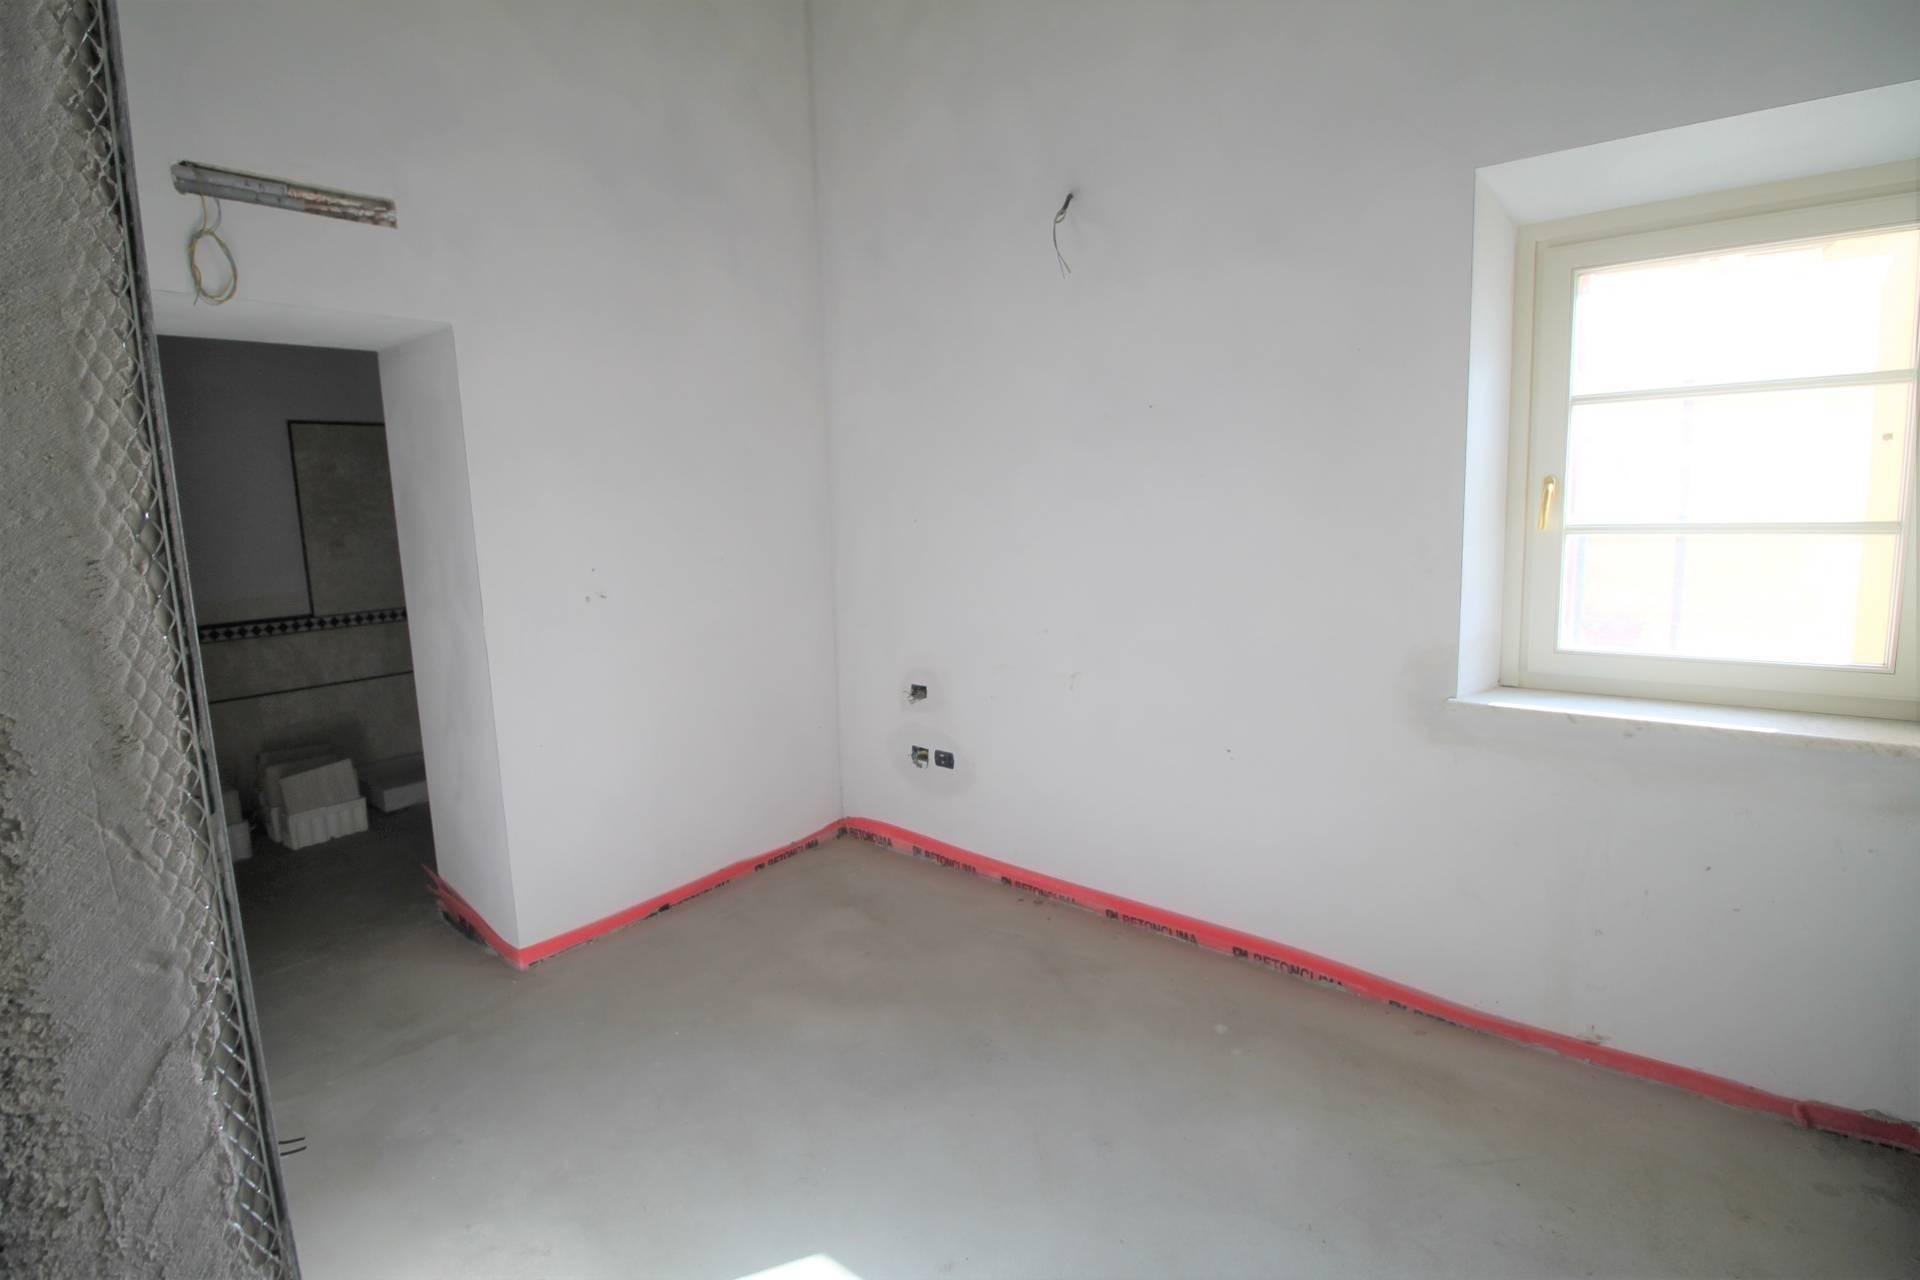 Appartamento in vendita, rif. V2901B